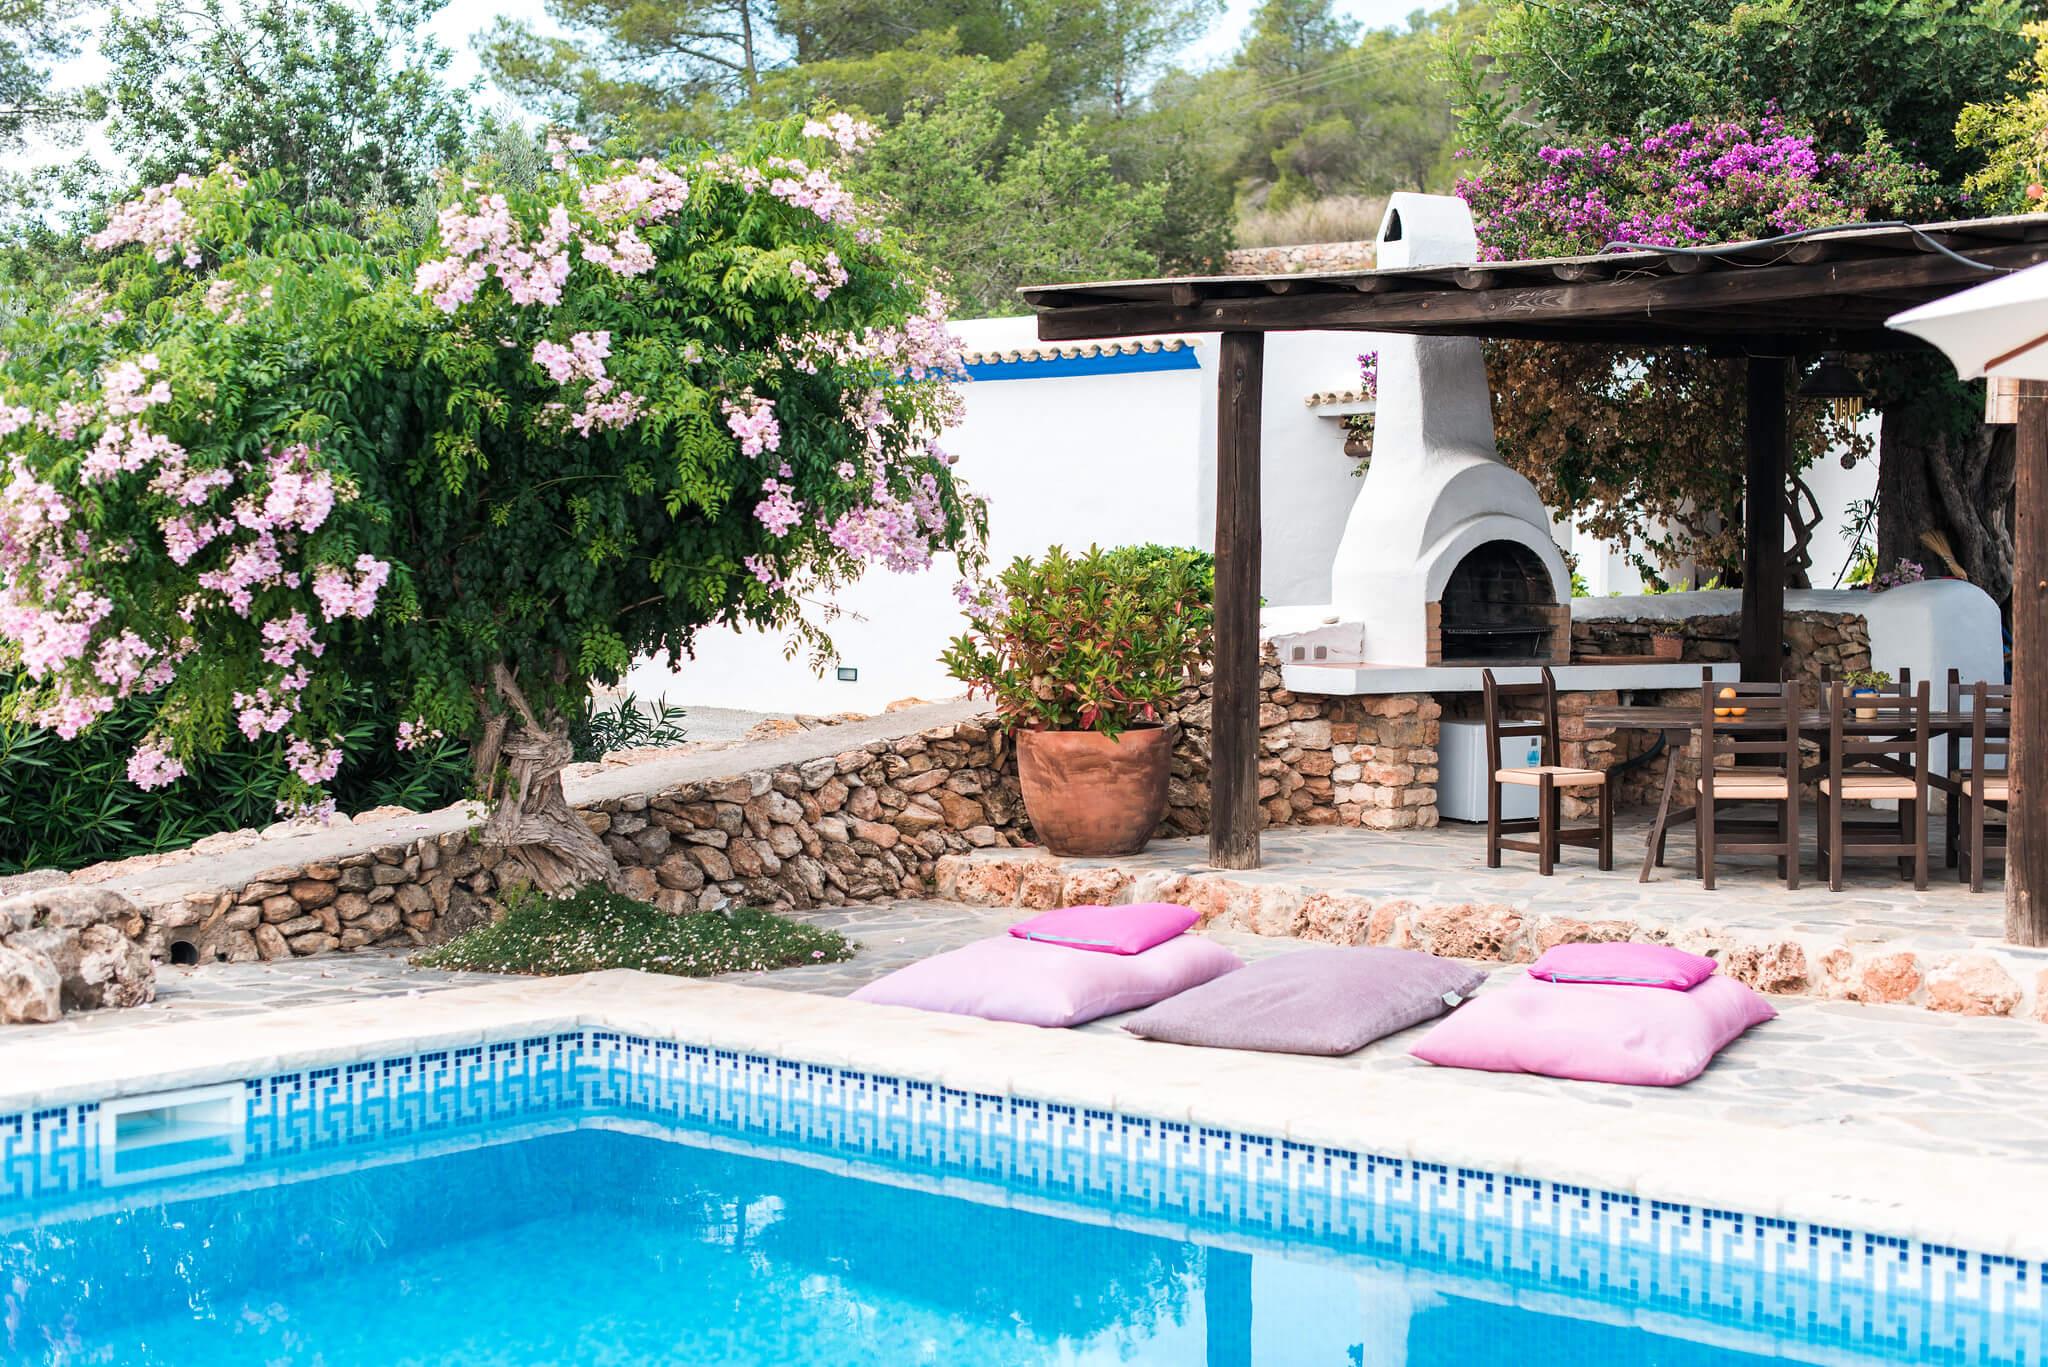 https://www.white-ibiza.com/wp-content/uploads/2020/05/white-ibiza-villas-canblay-corner-of-pool.jpg